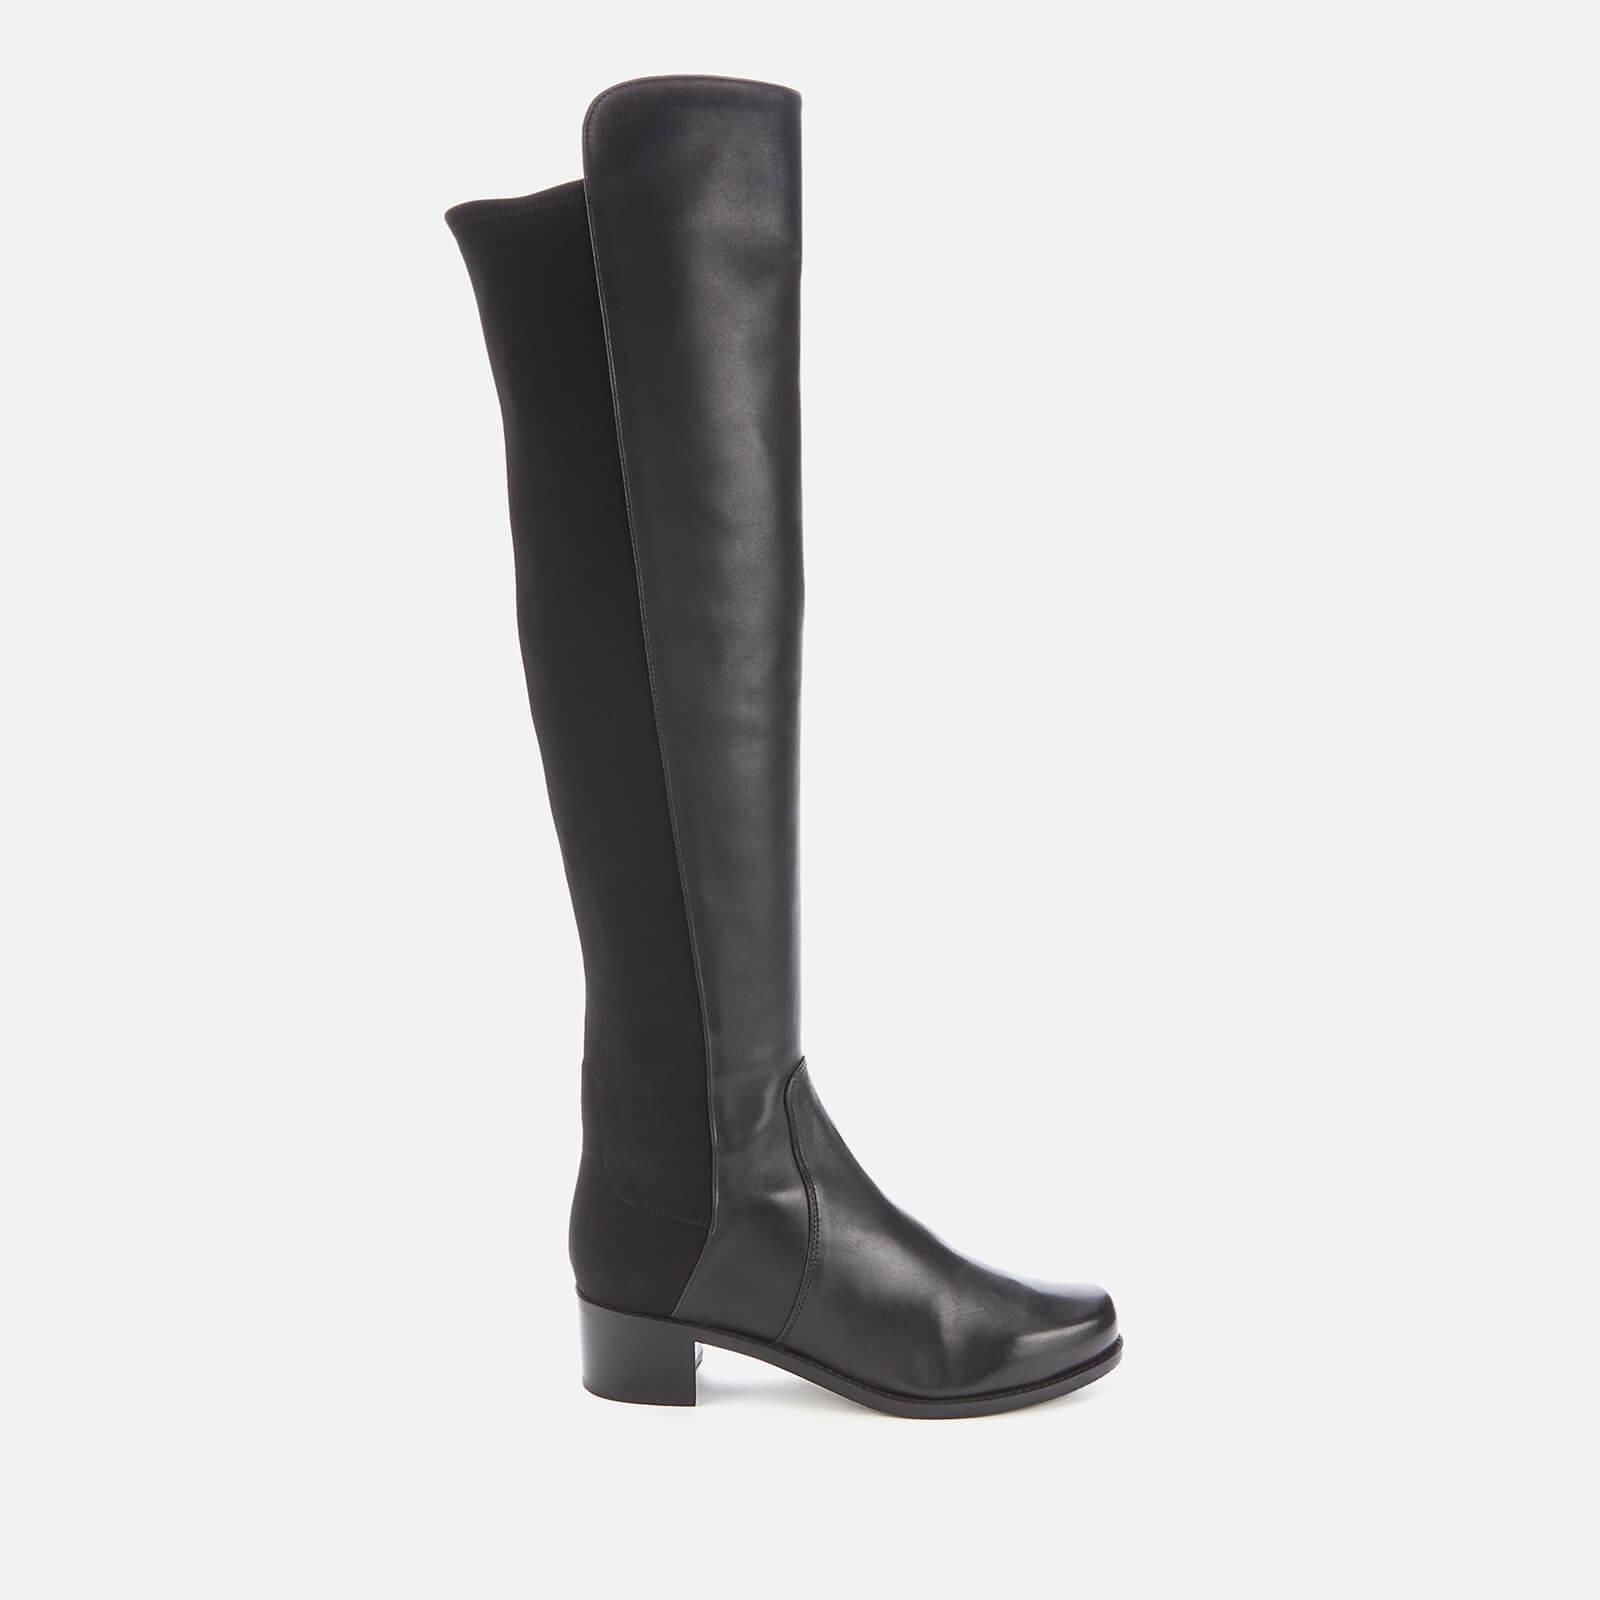 Stuart Weitzman Women's Reserve Leather/Suede Over The Knee Boots - Black - Uk 7